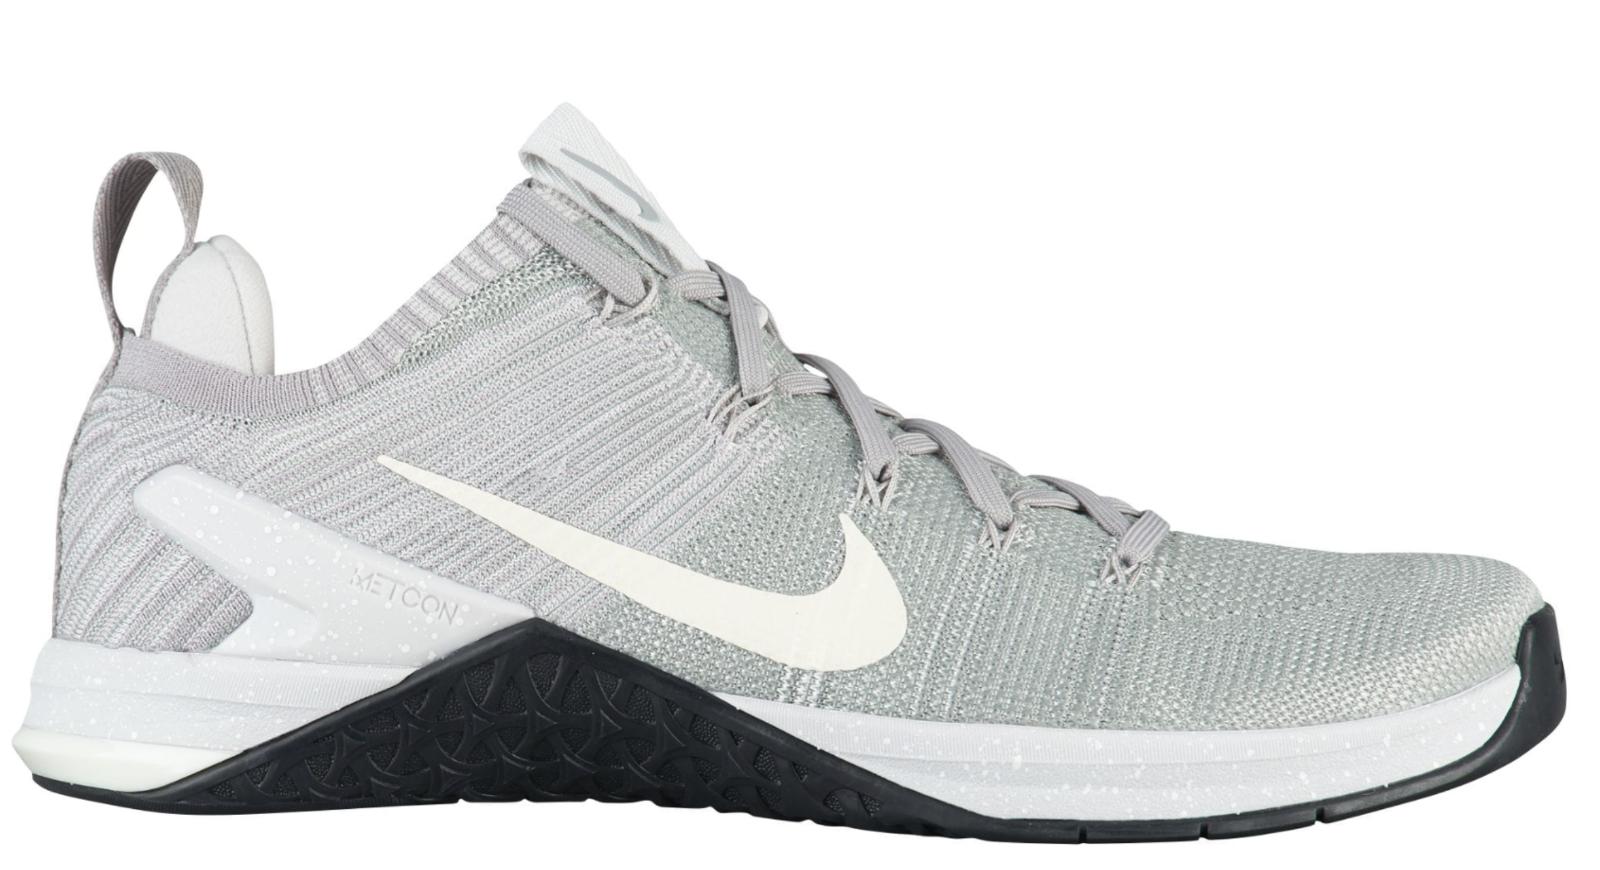 NUOVO Nike Metcon DSX Flybark 2 - Men's  Matte argento Training scarpe 924423 -011 rc1  online economico